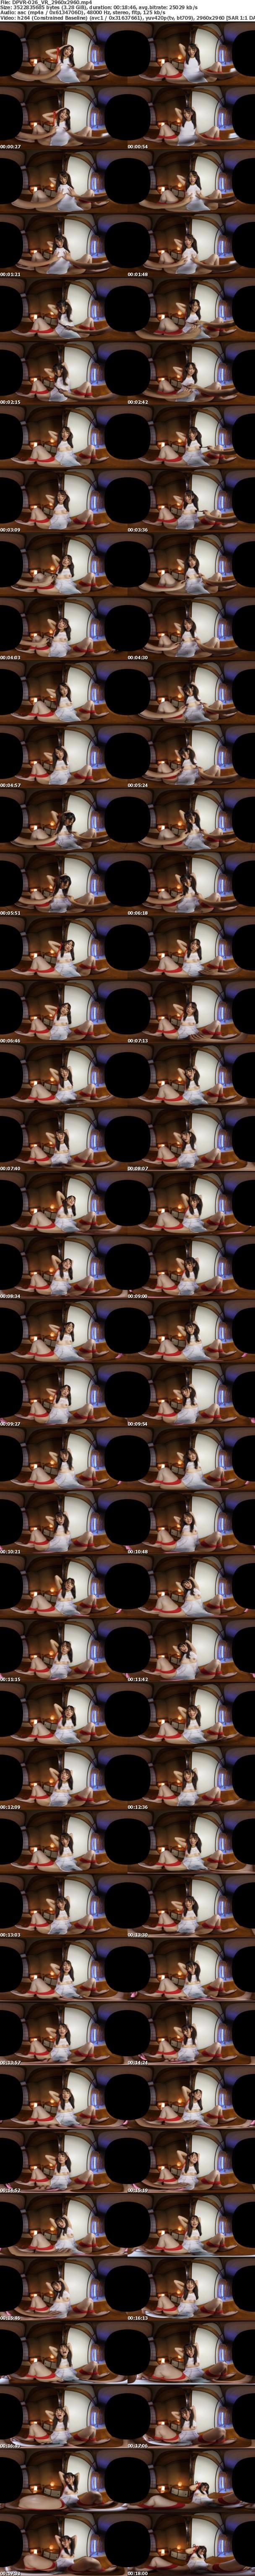 VR/3D DPVR-026 【VR】バイノーラル もしも美咲かんながM女だったら…